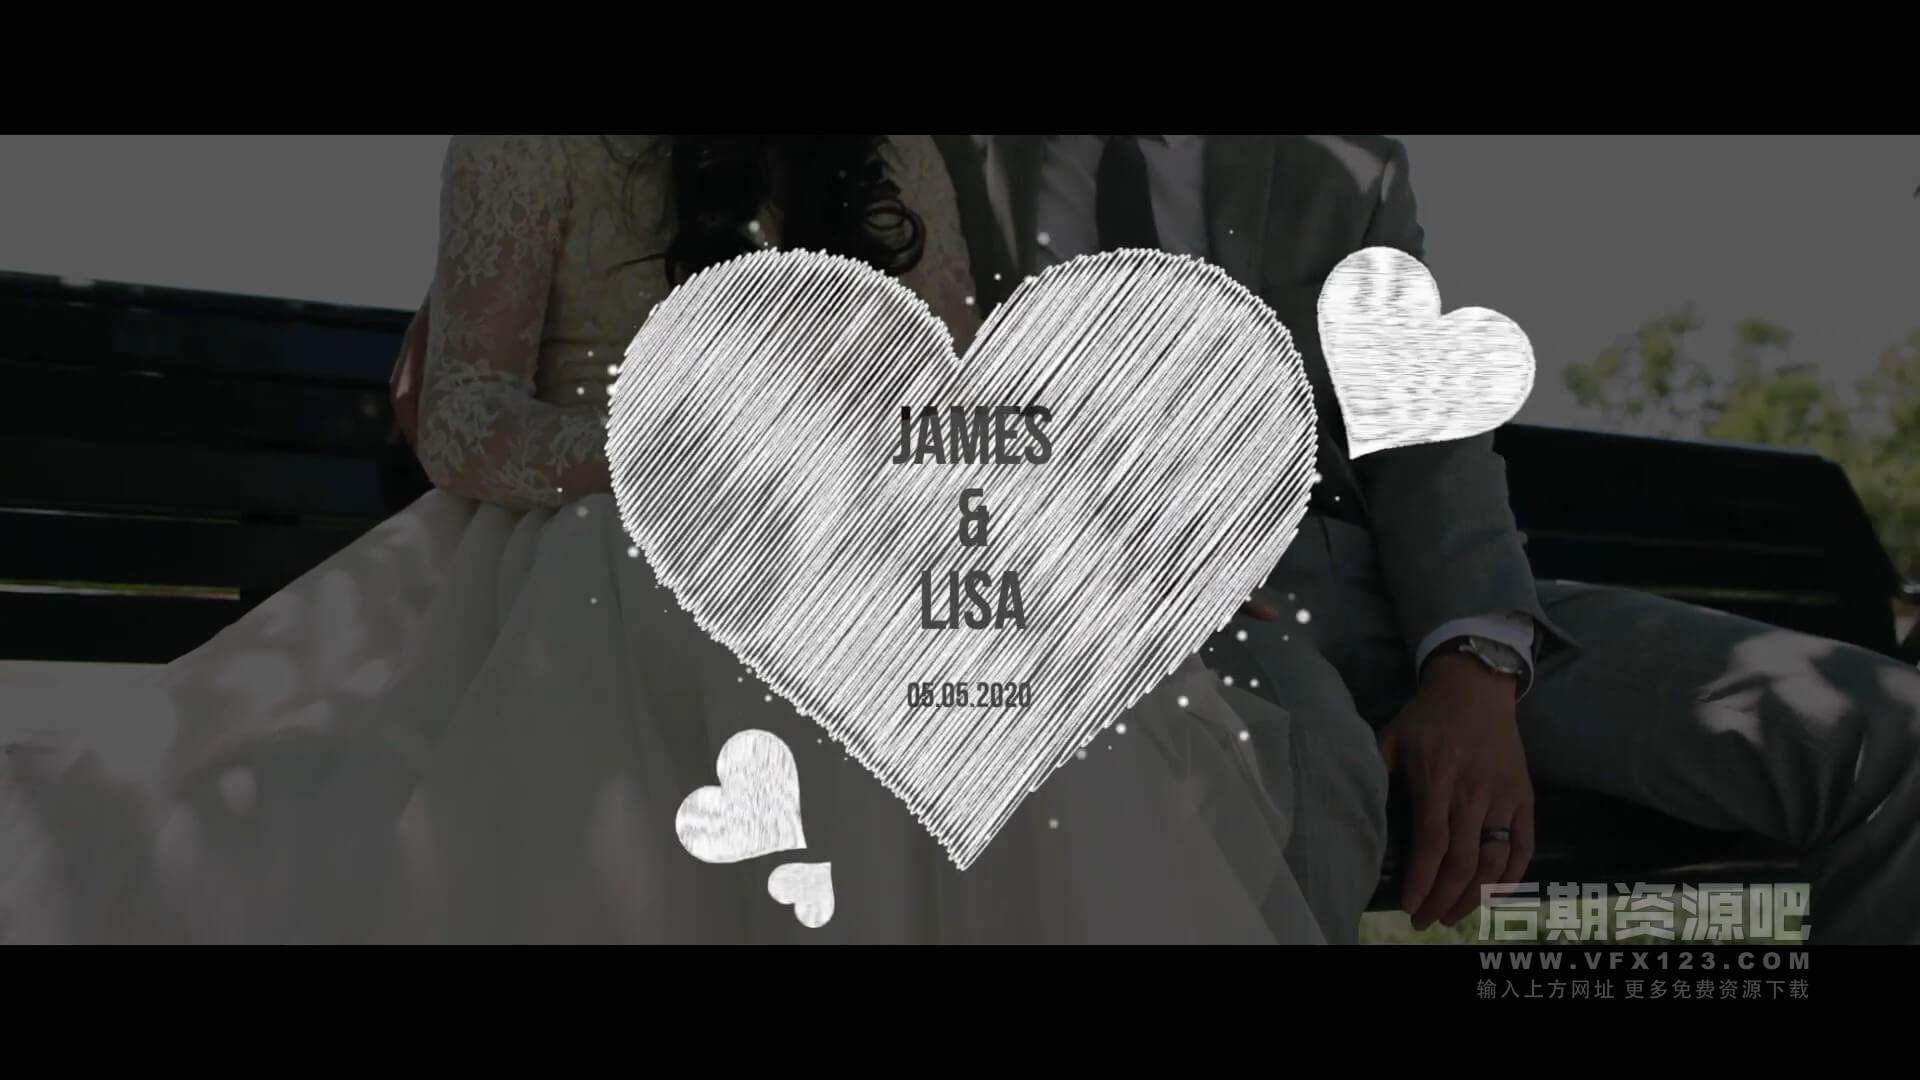 fcpx模板 婚礼MV开场写真影片制作素材包 Wedding Pack